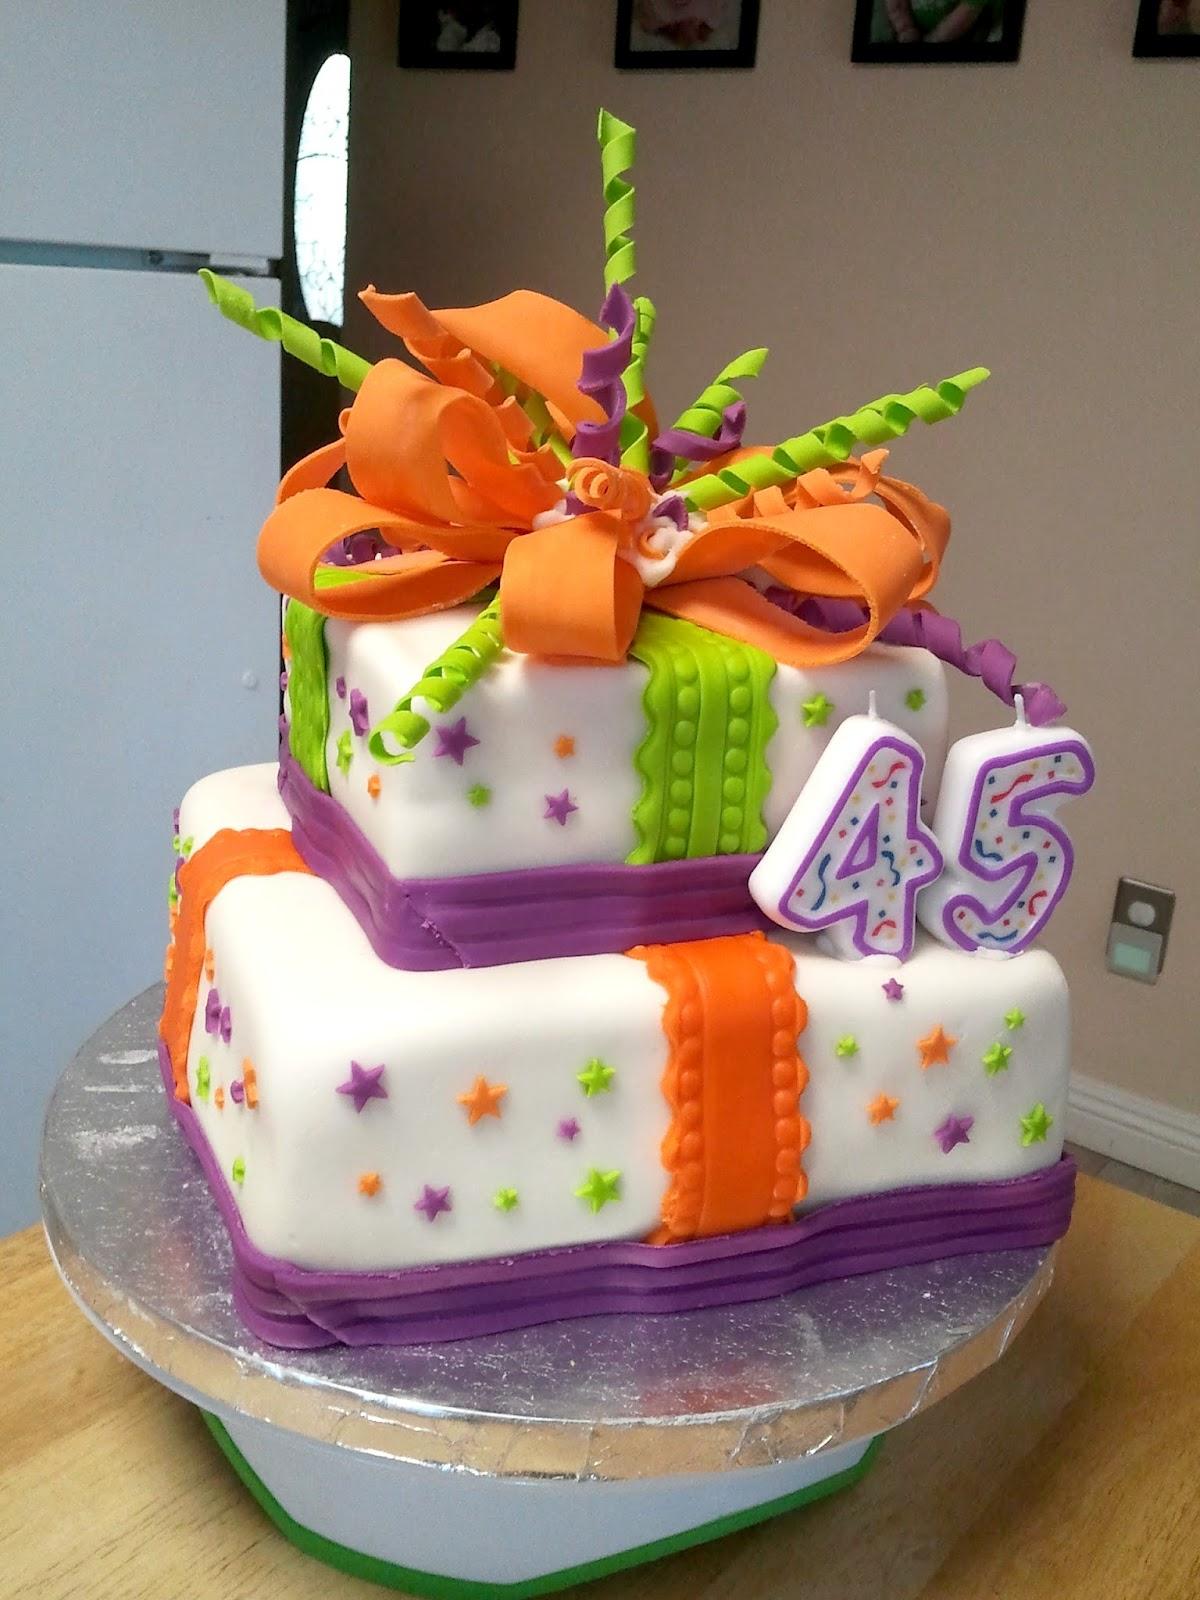 Tiered Fondant Birthday Present Cake Cake Pop Insanity